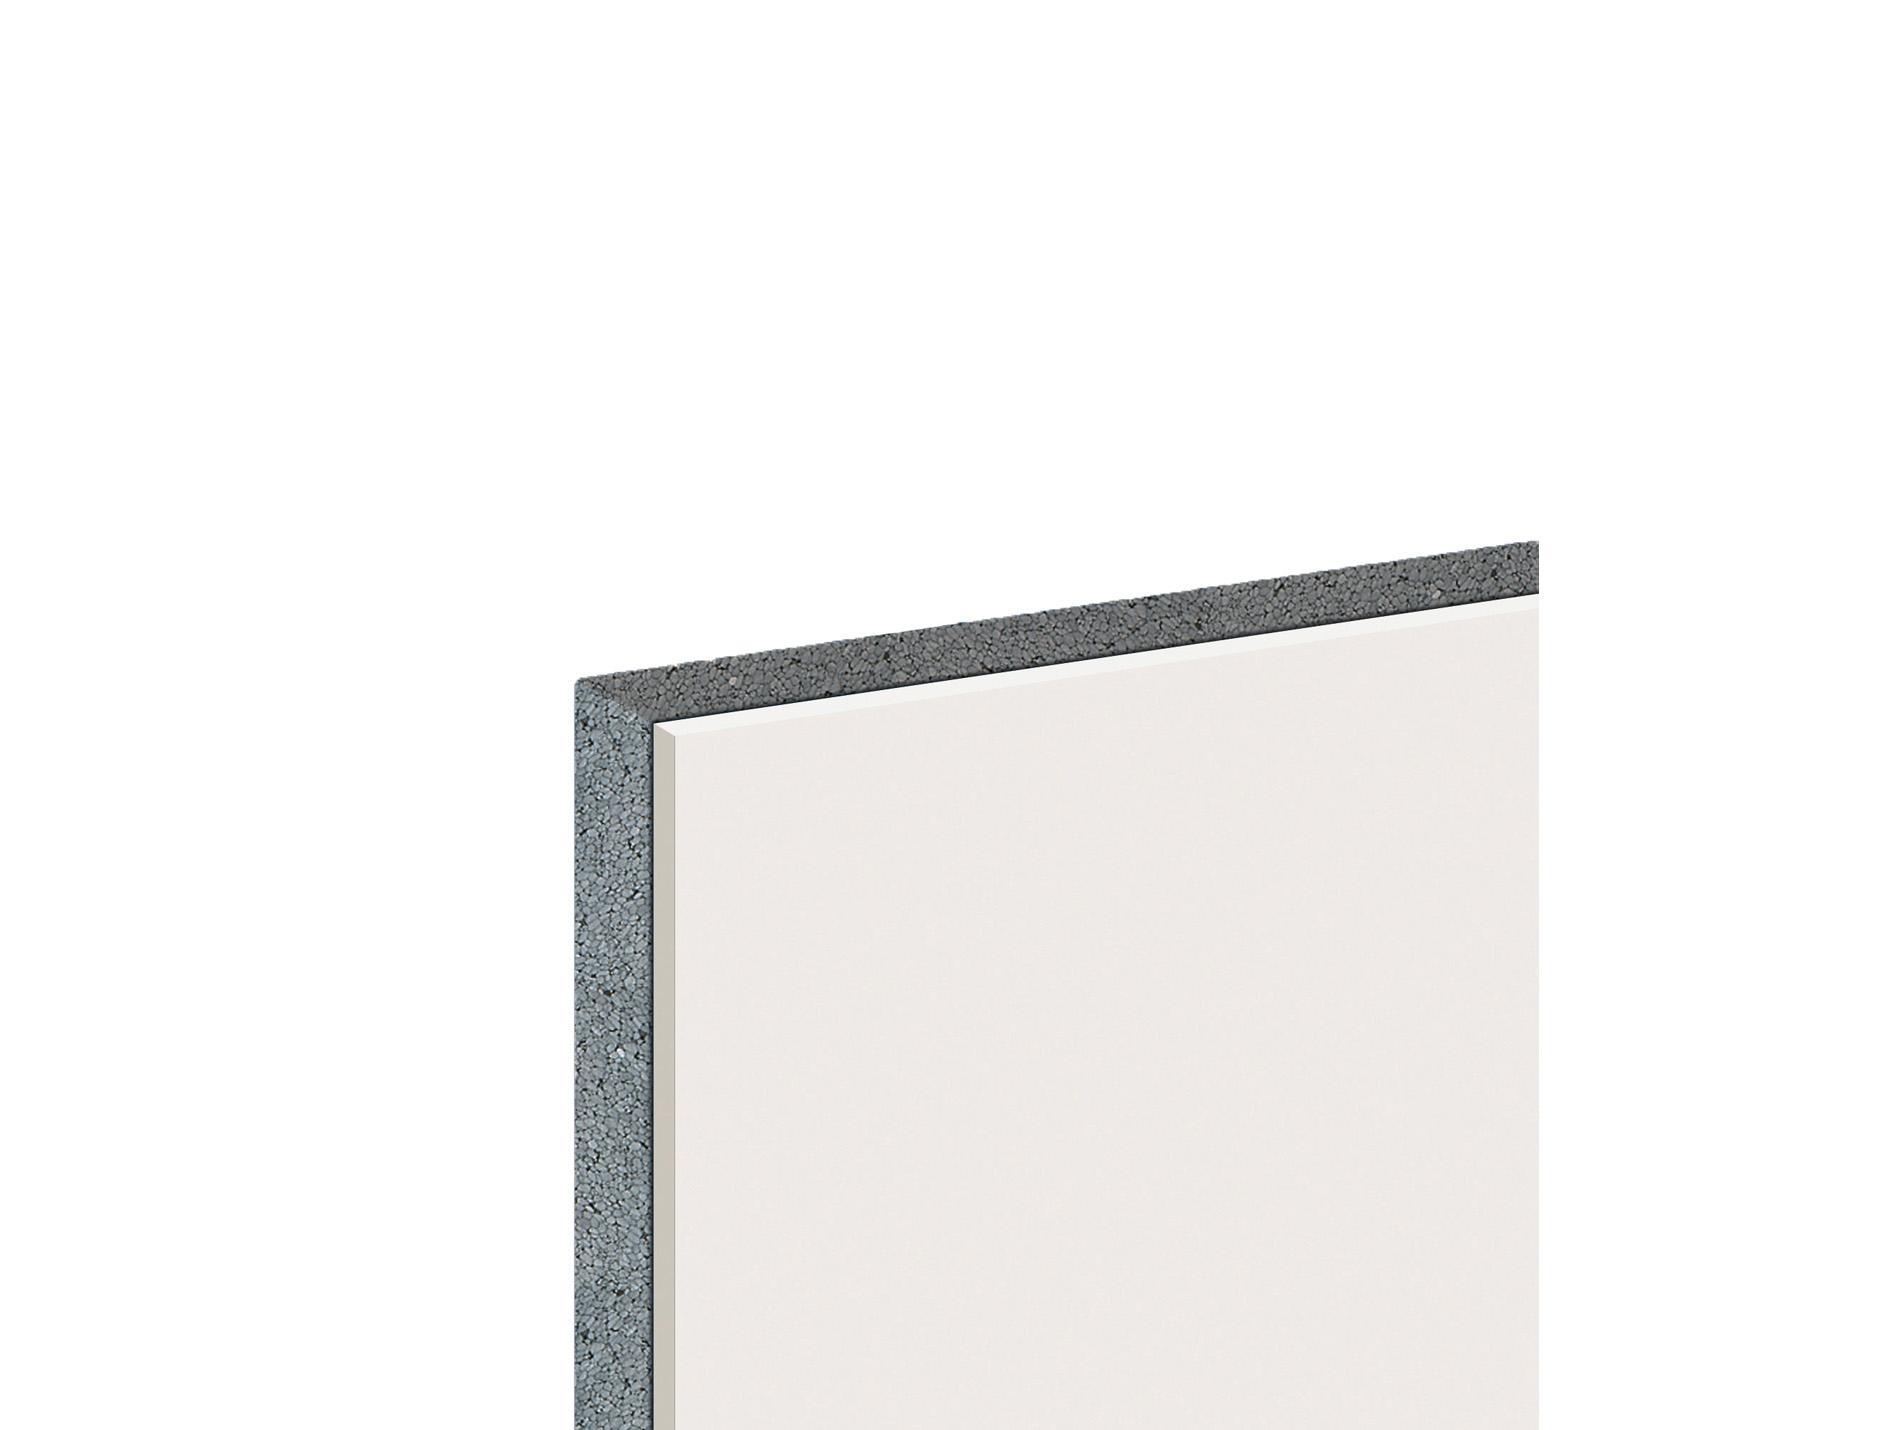 doublage polystyr ne expans th32 13 80mm. Black Bedroom Furniture Sets. Home Design Ideas